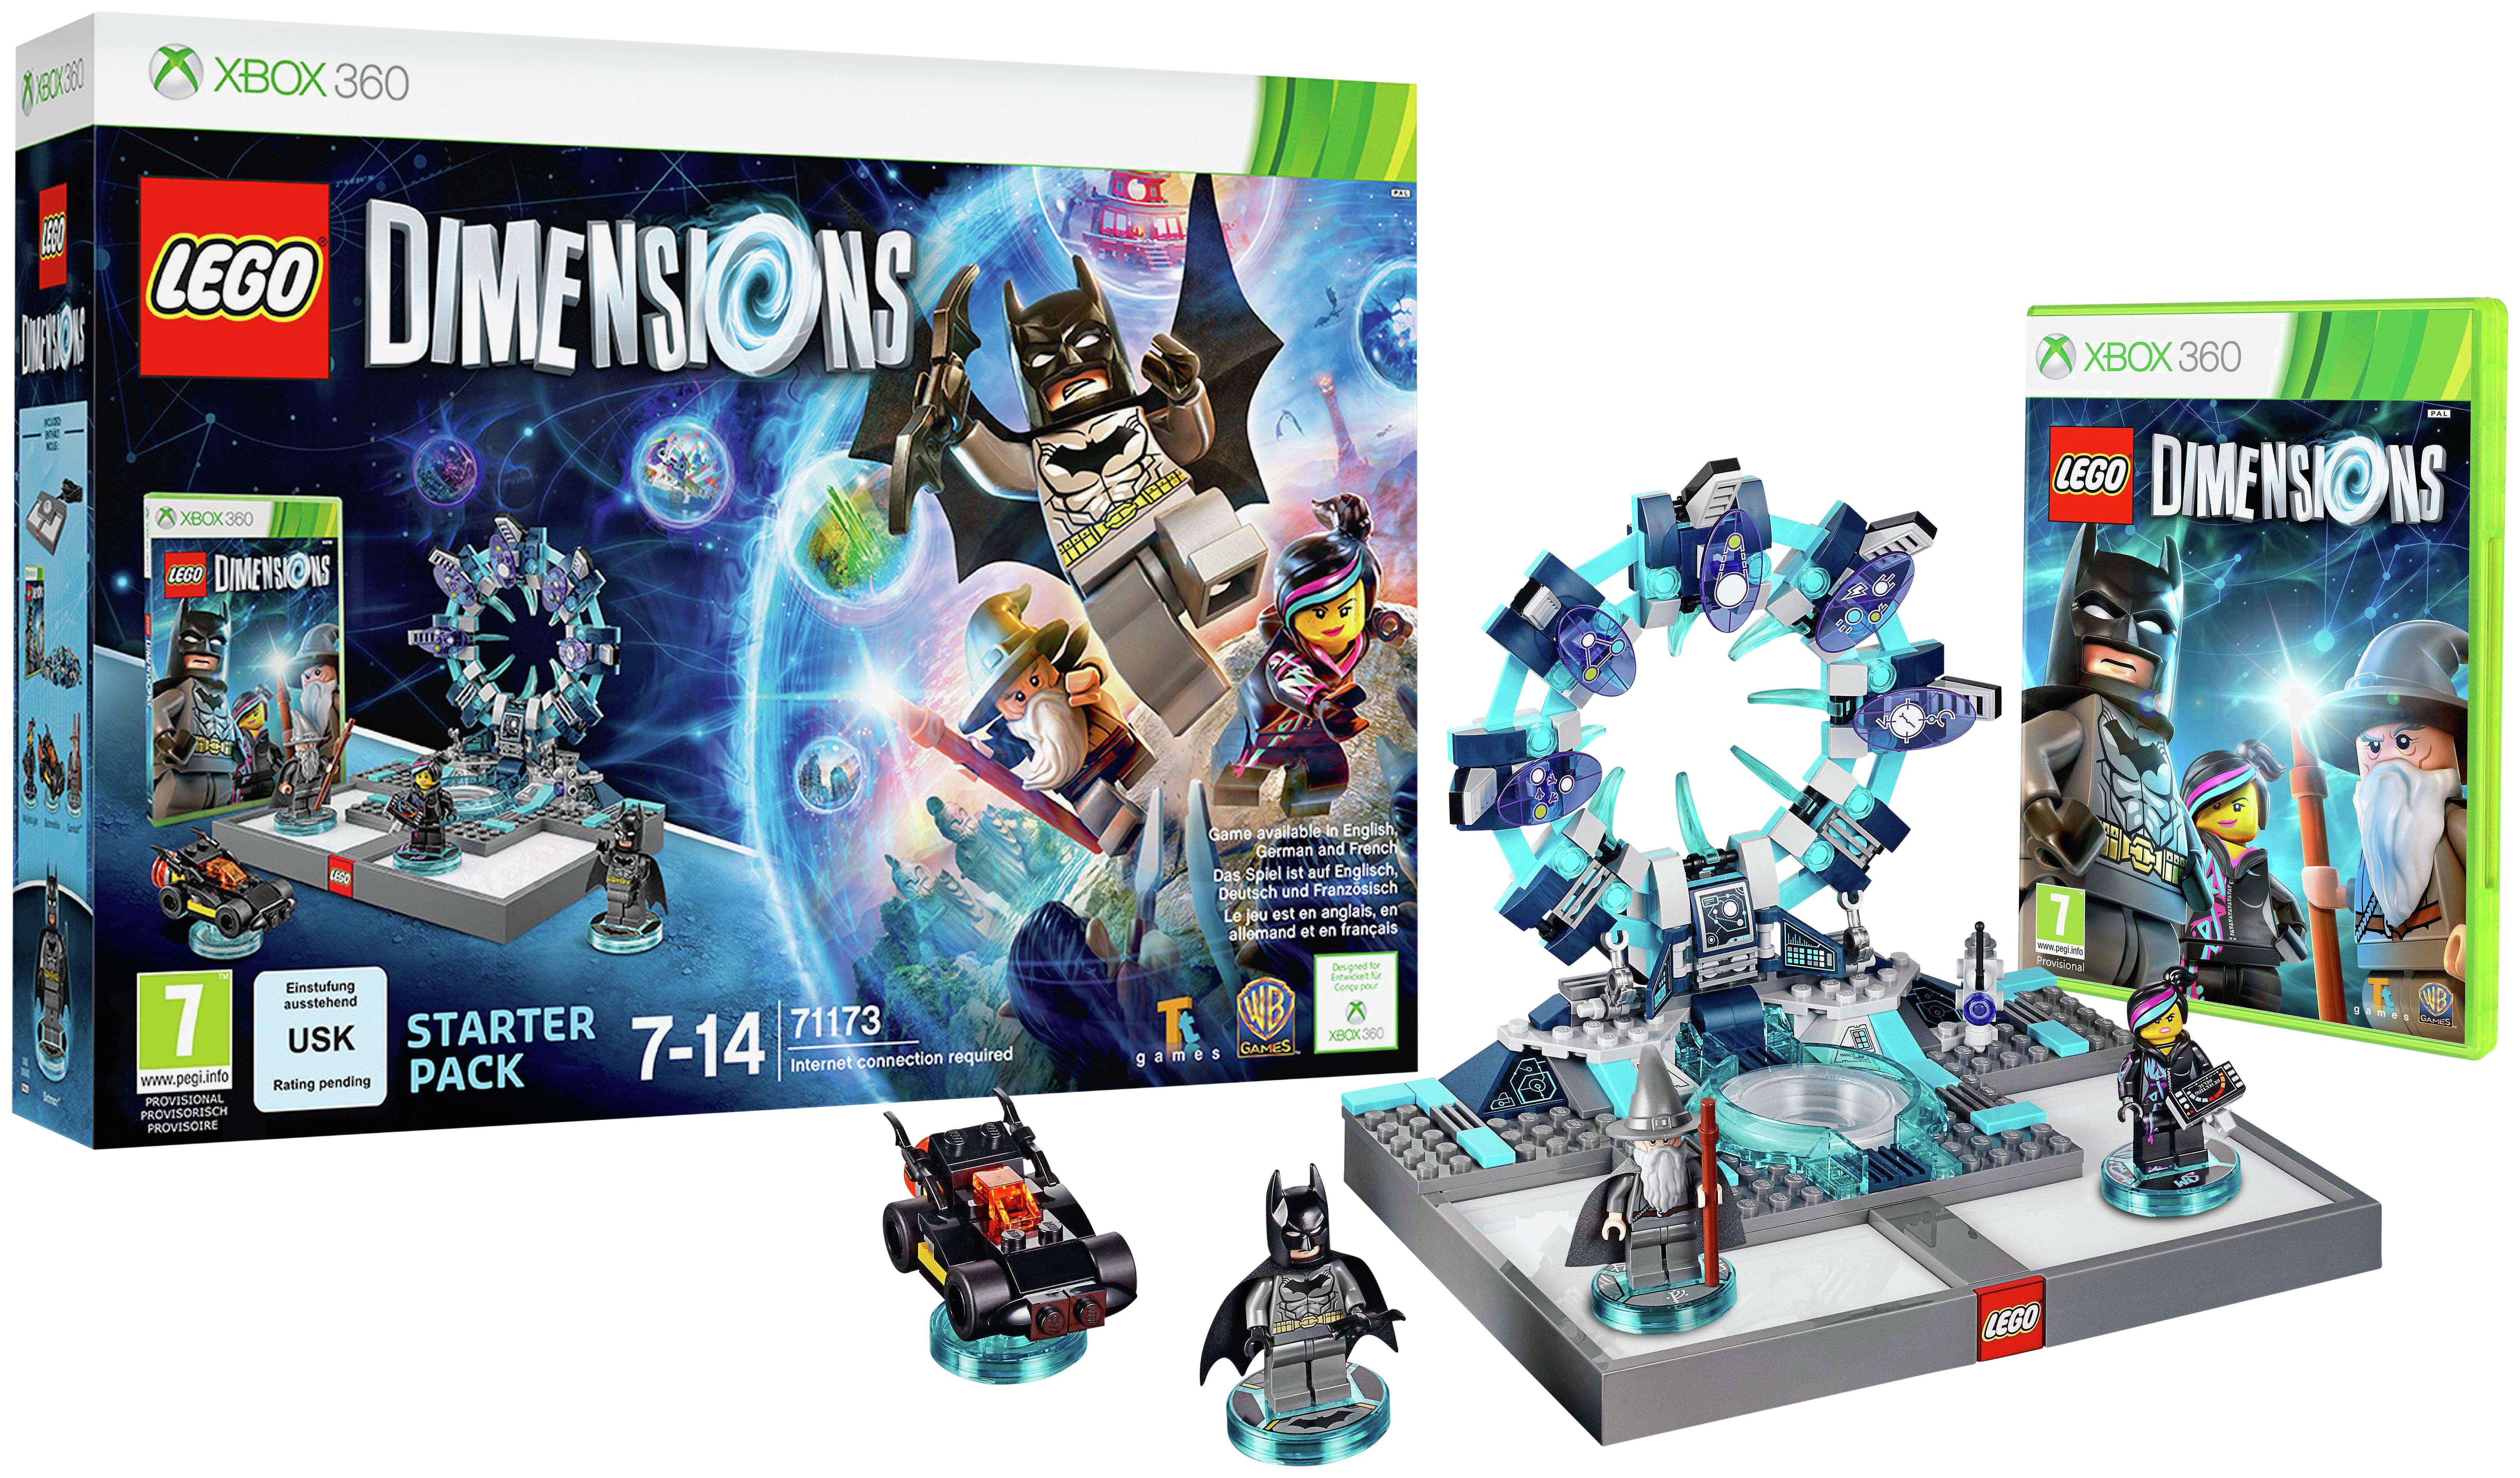 Buy LEGO Dimensions Starter Pack - Xbox 360   Lego Dimensions   Argos